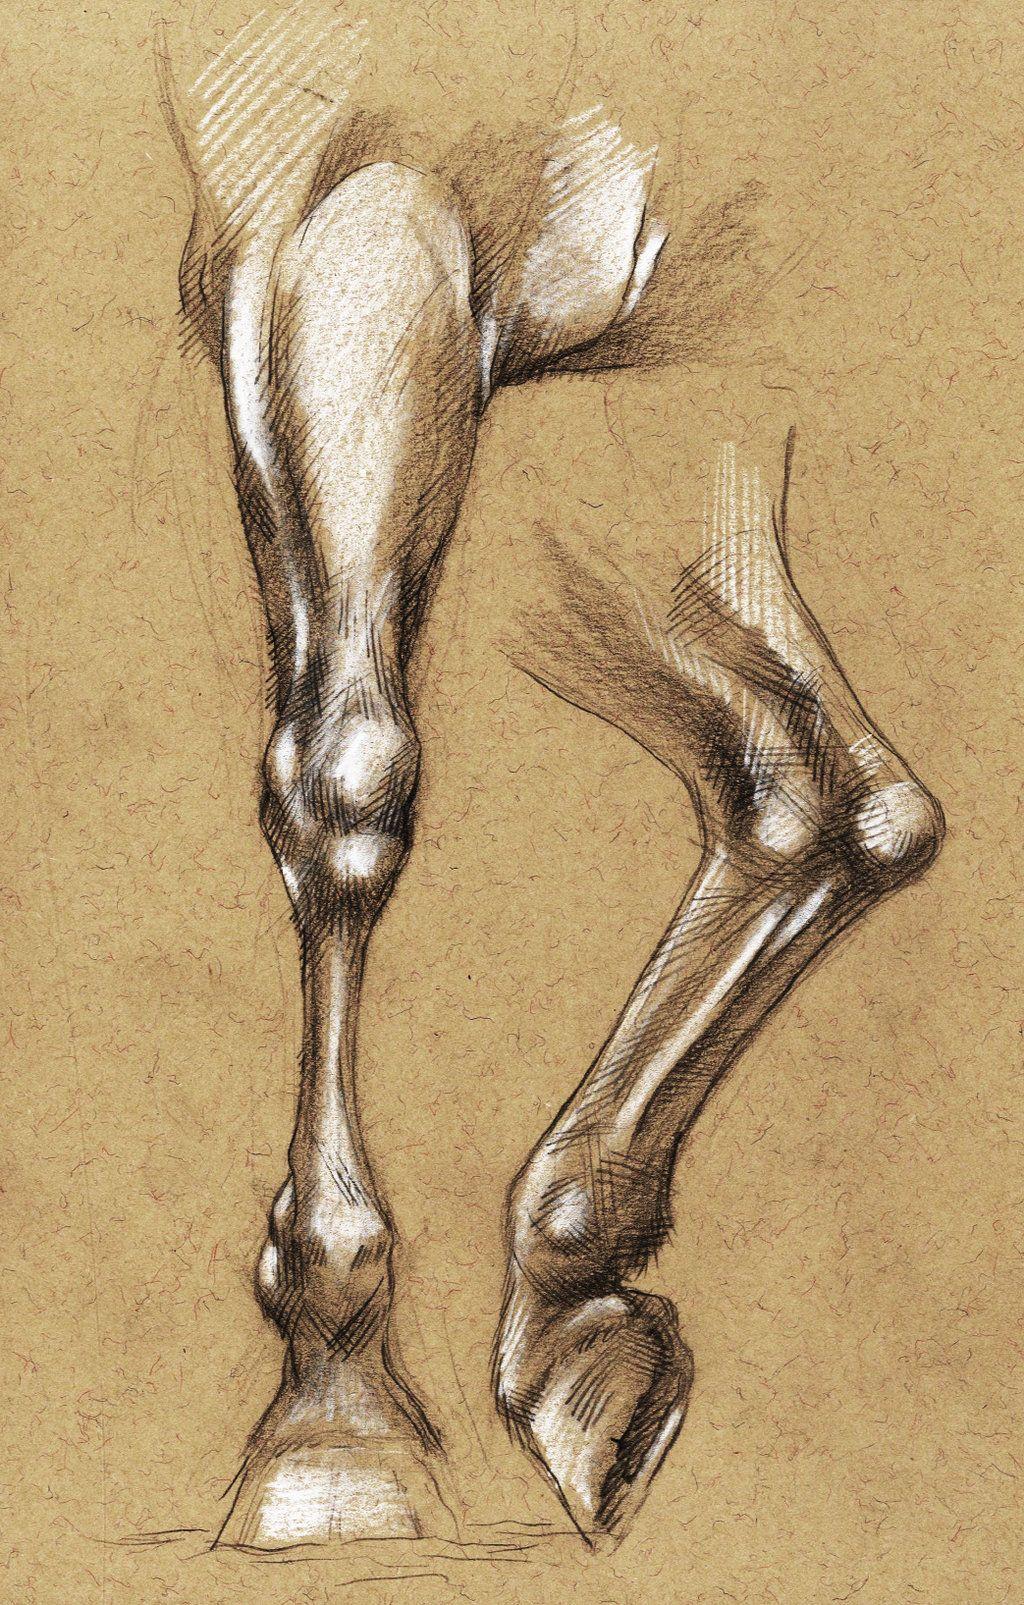 Horse leg anatomy by tirin54.deviantart.com on @deviantART | horses ...